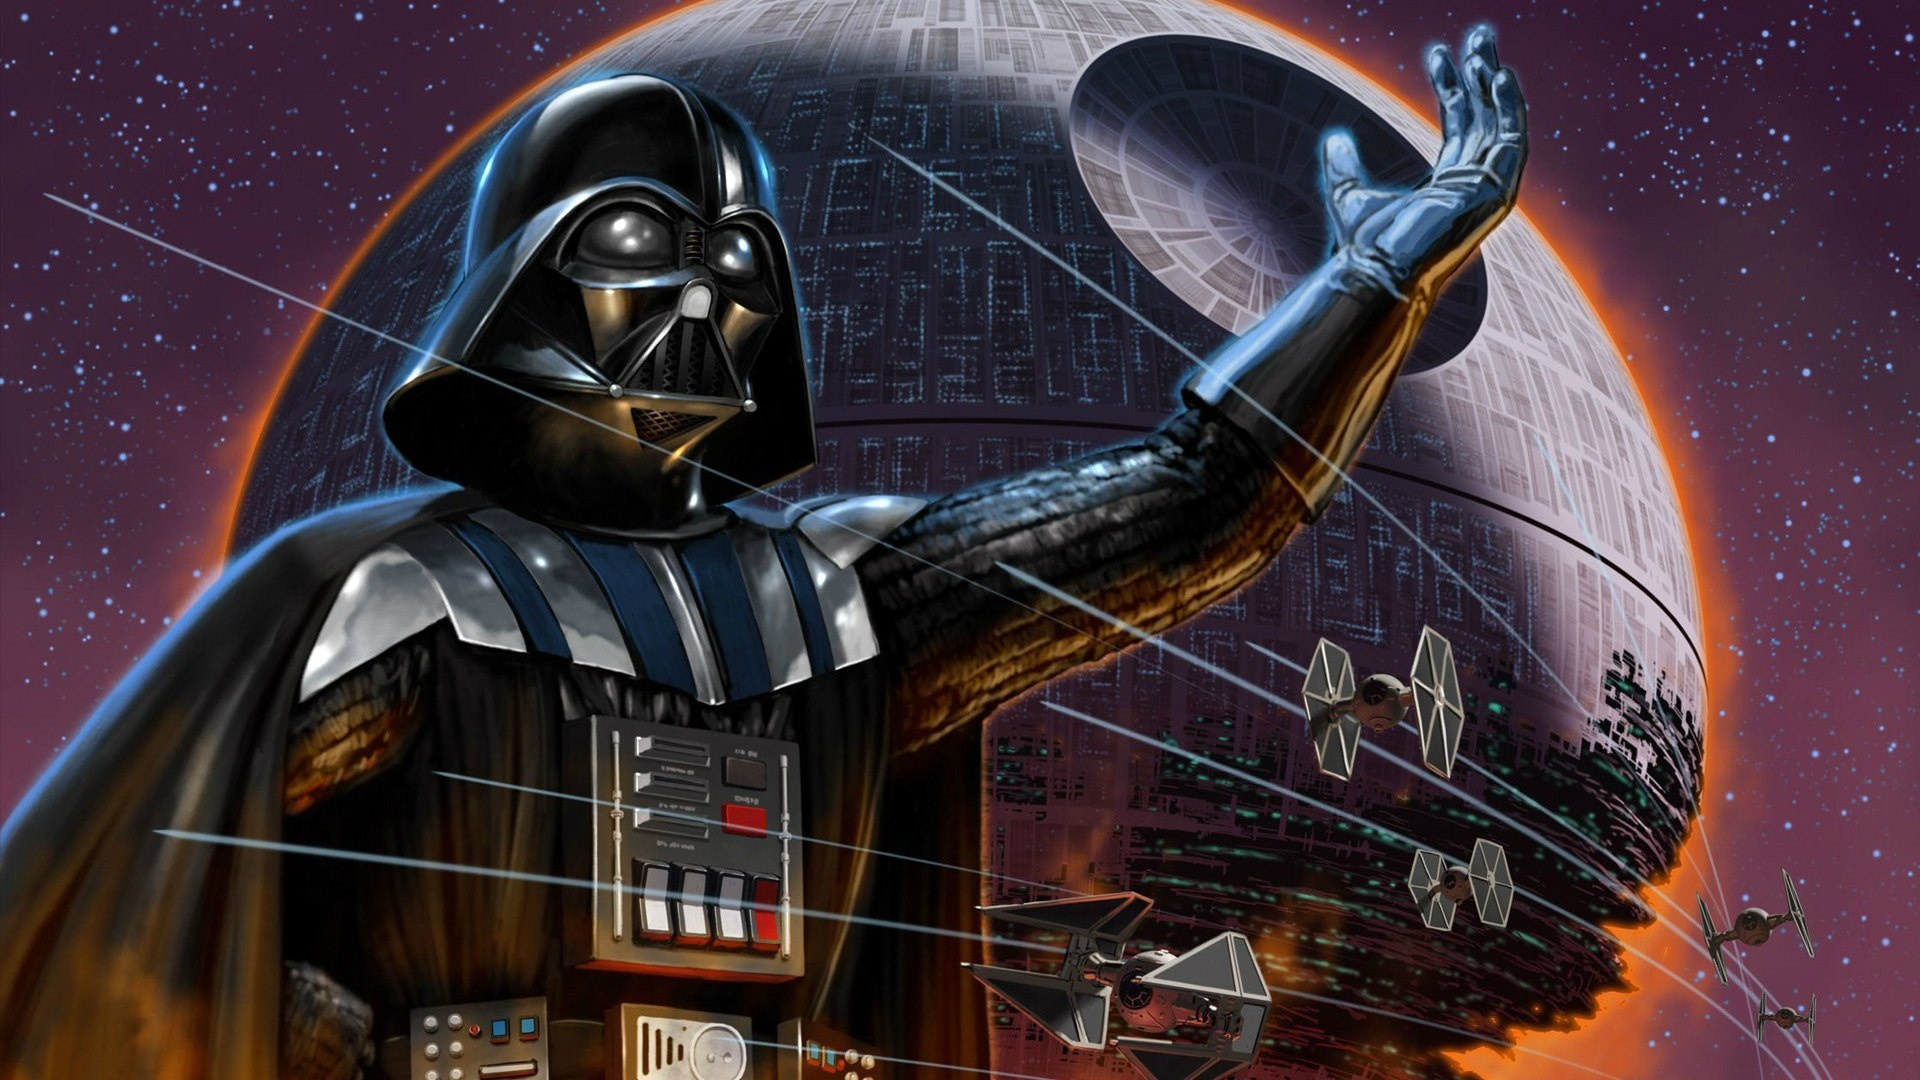 Star Wars windows wallpaper